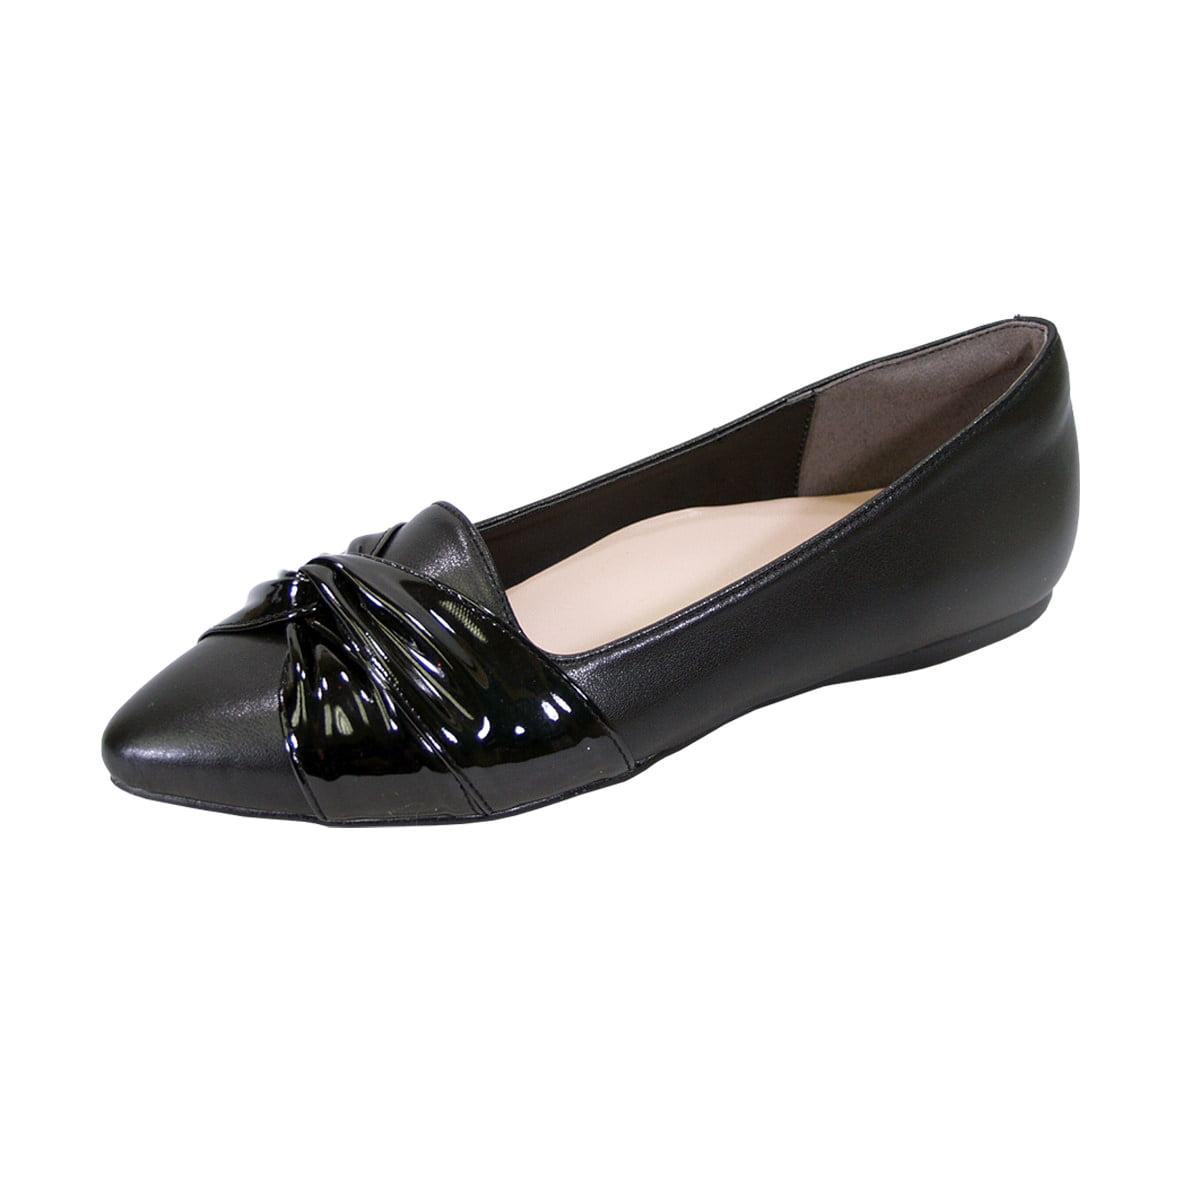 Peerage Whitney Ft6045 Women Wide Width Pointed Toe Flats Black 10